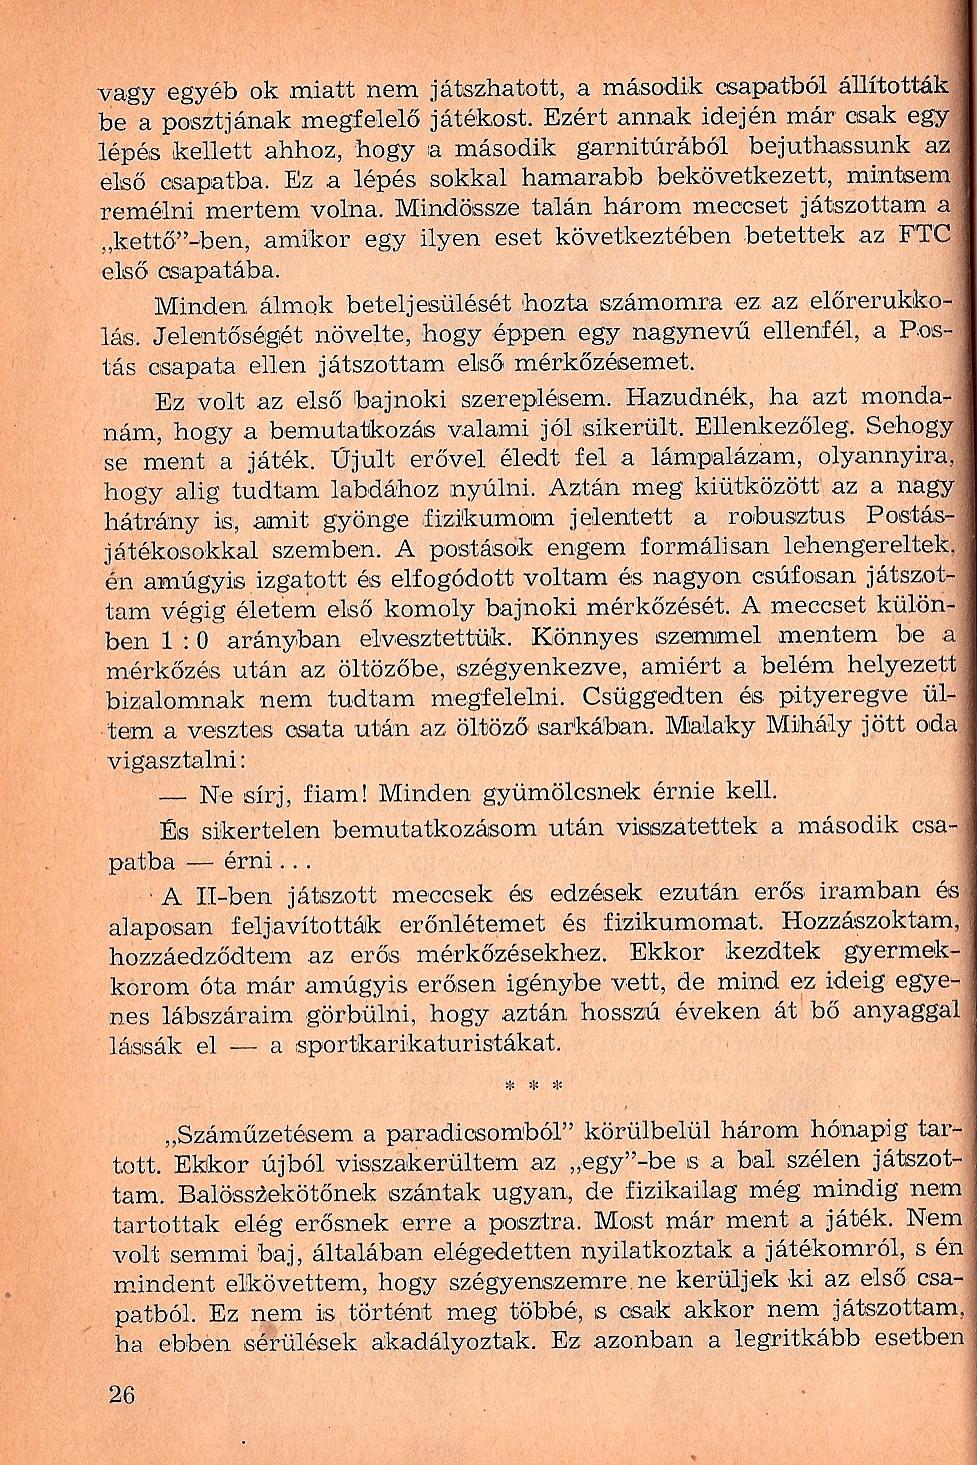 schlosser_fel-evszazad_1957_26_1020